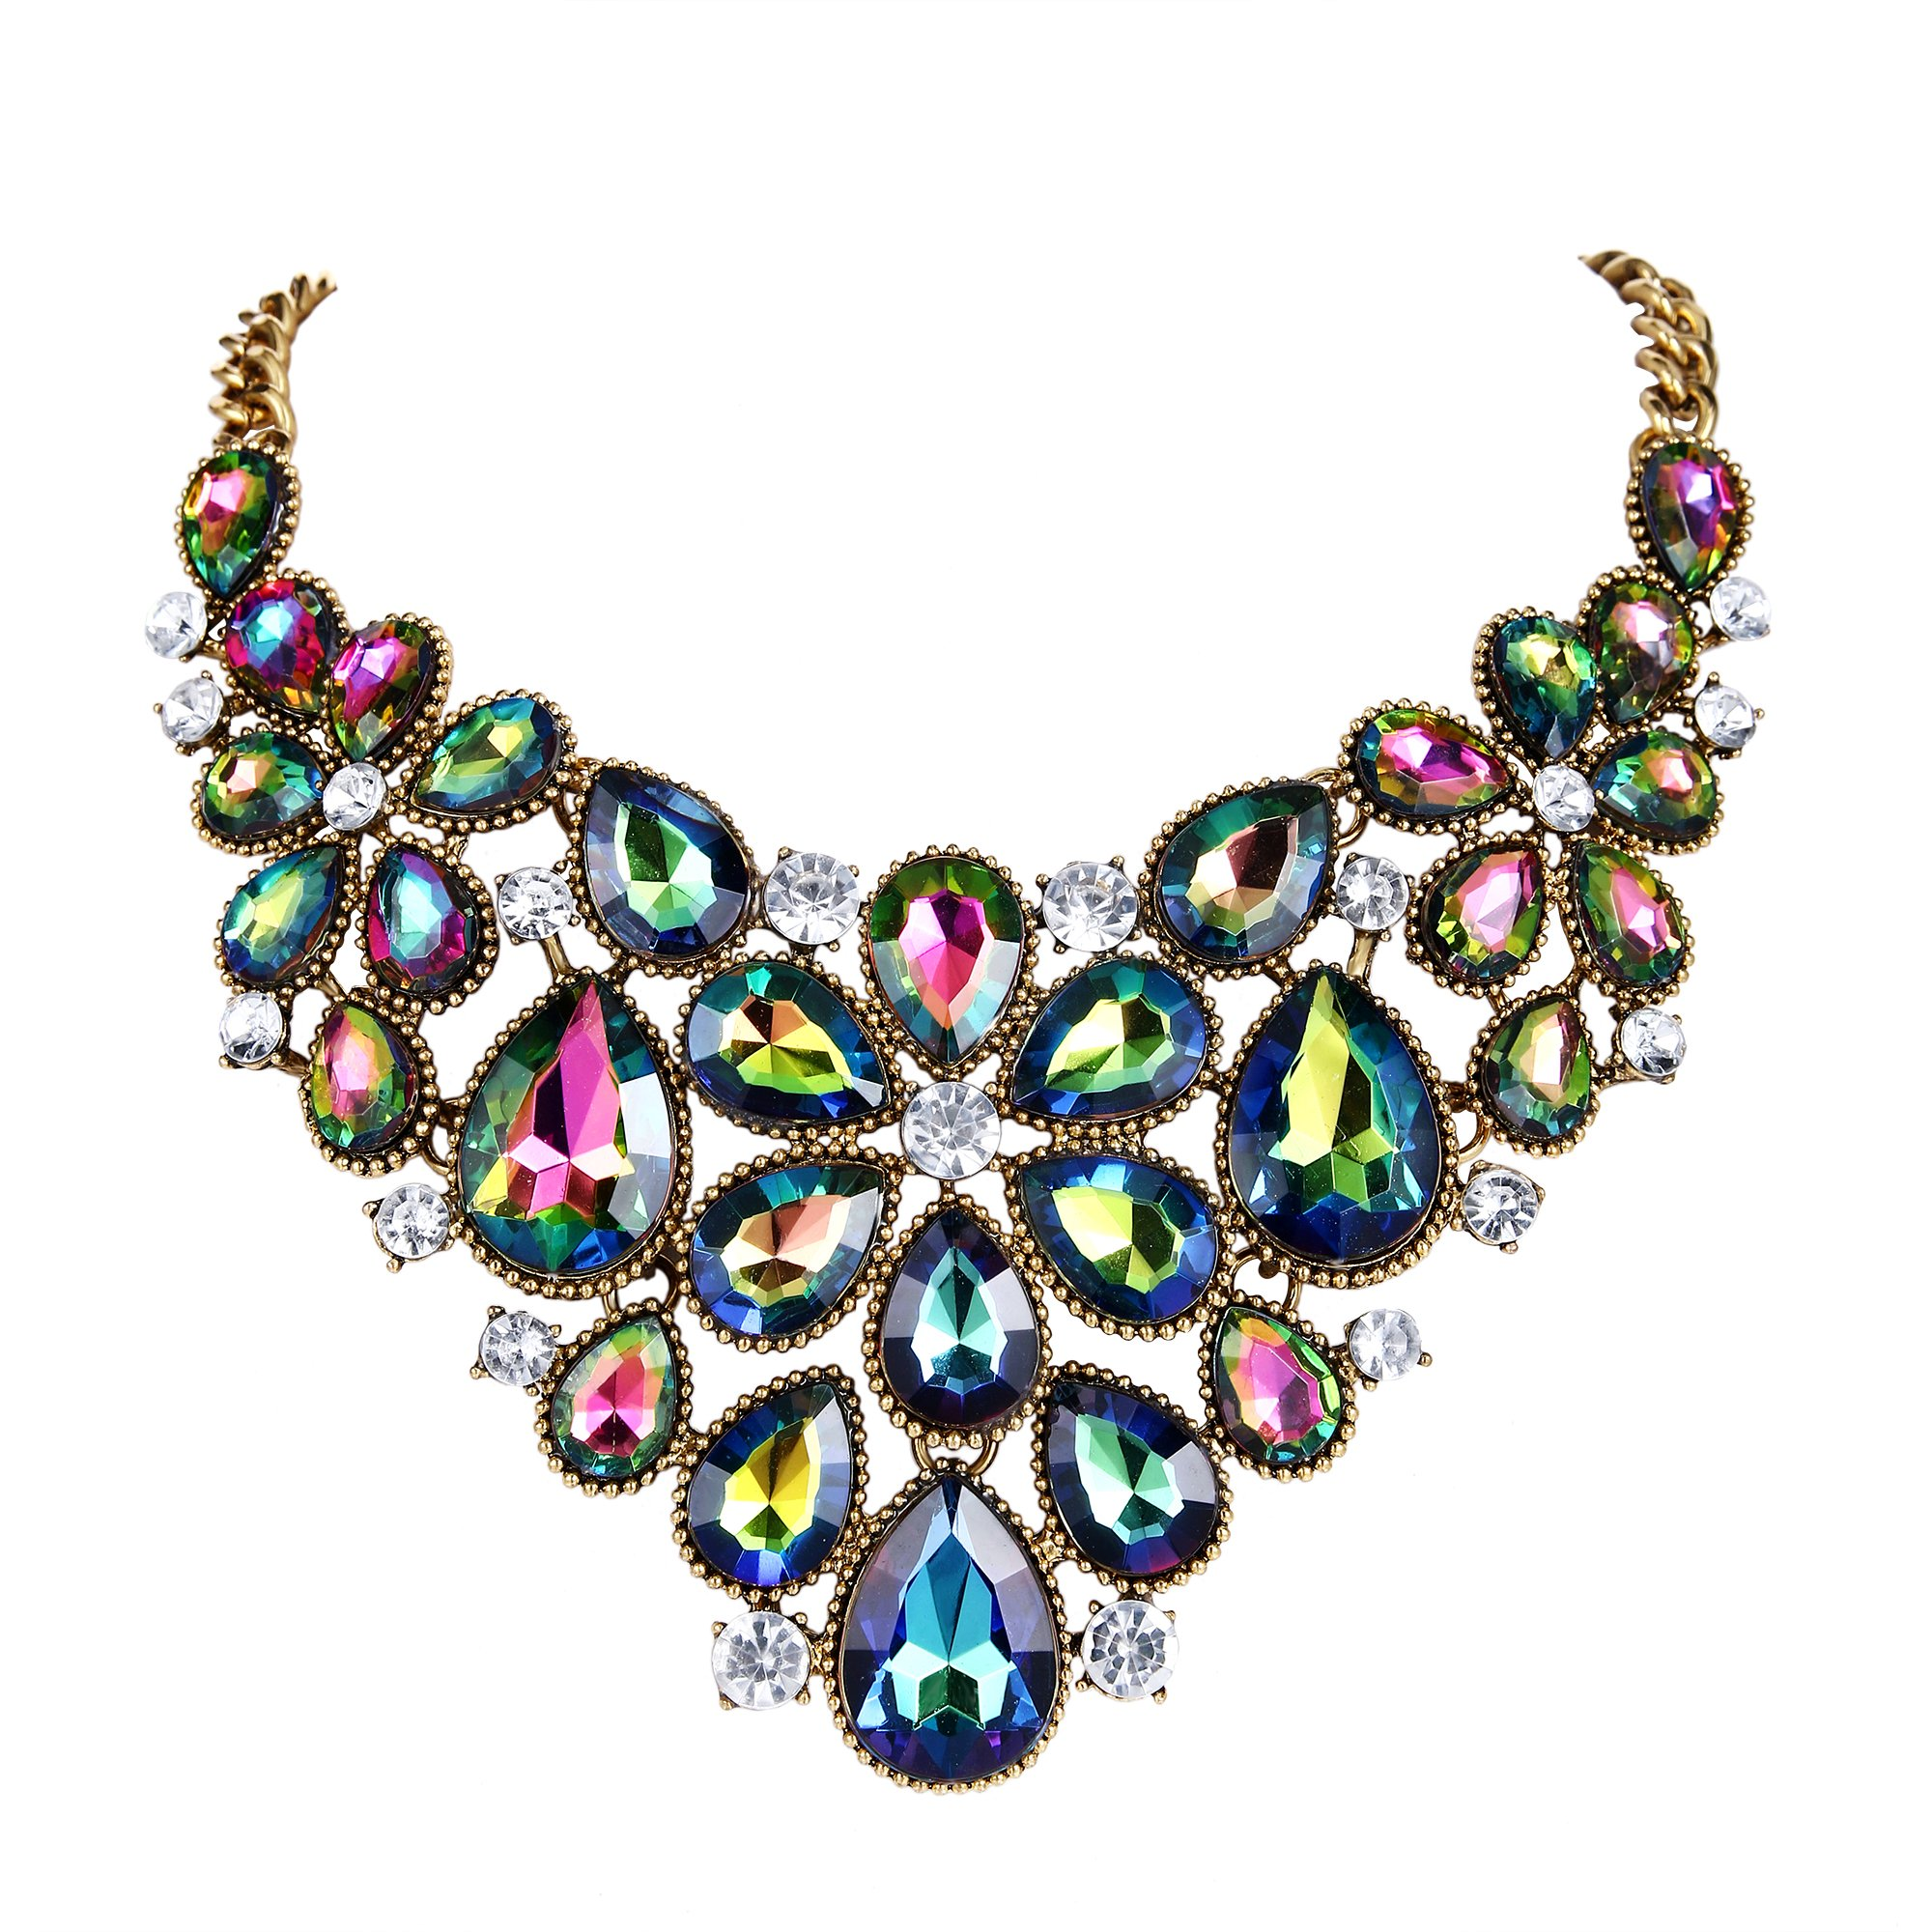 BriLove Women's Tribal Ethnic Crystal Multi Teardrop Flower Statement Necklace Vitrail Medium Gold-Tone